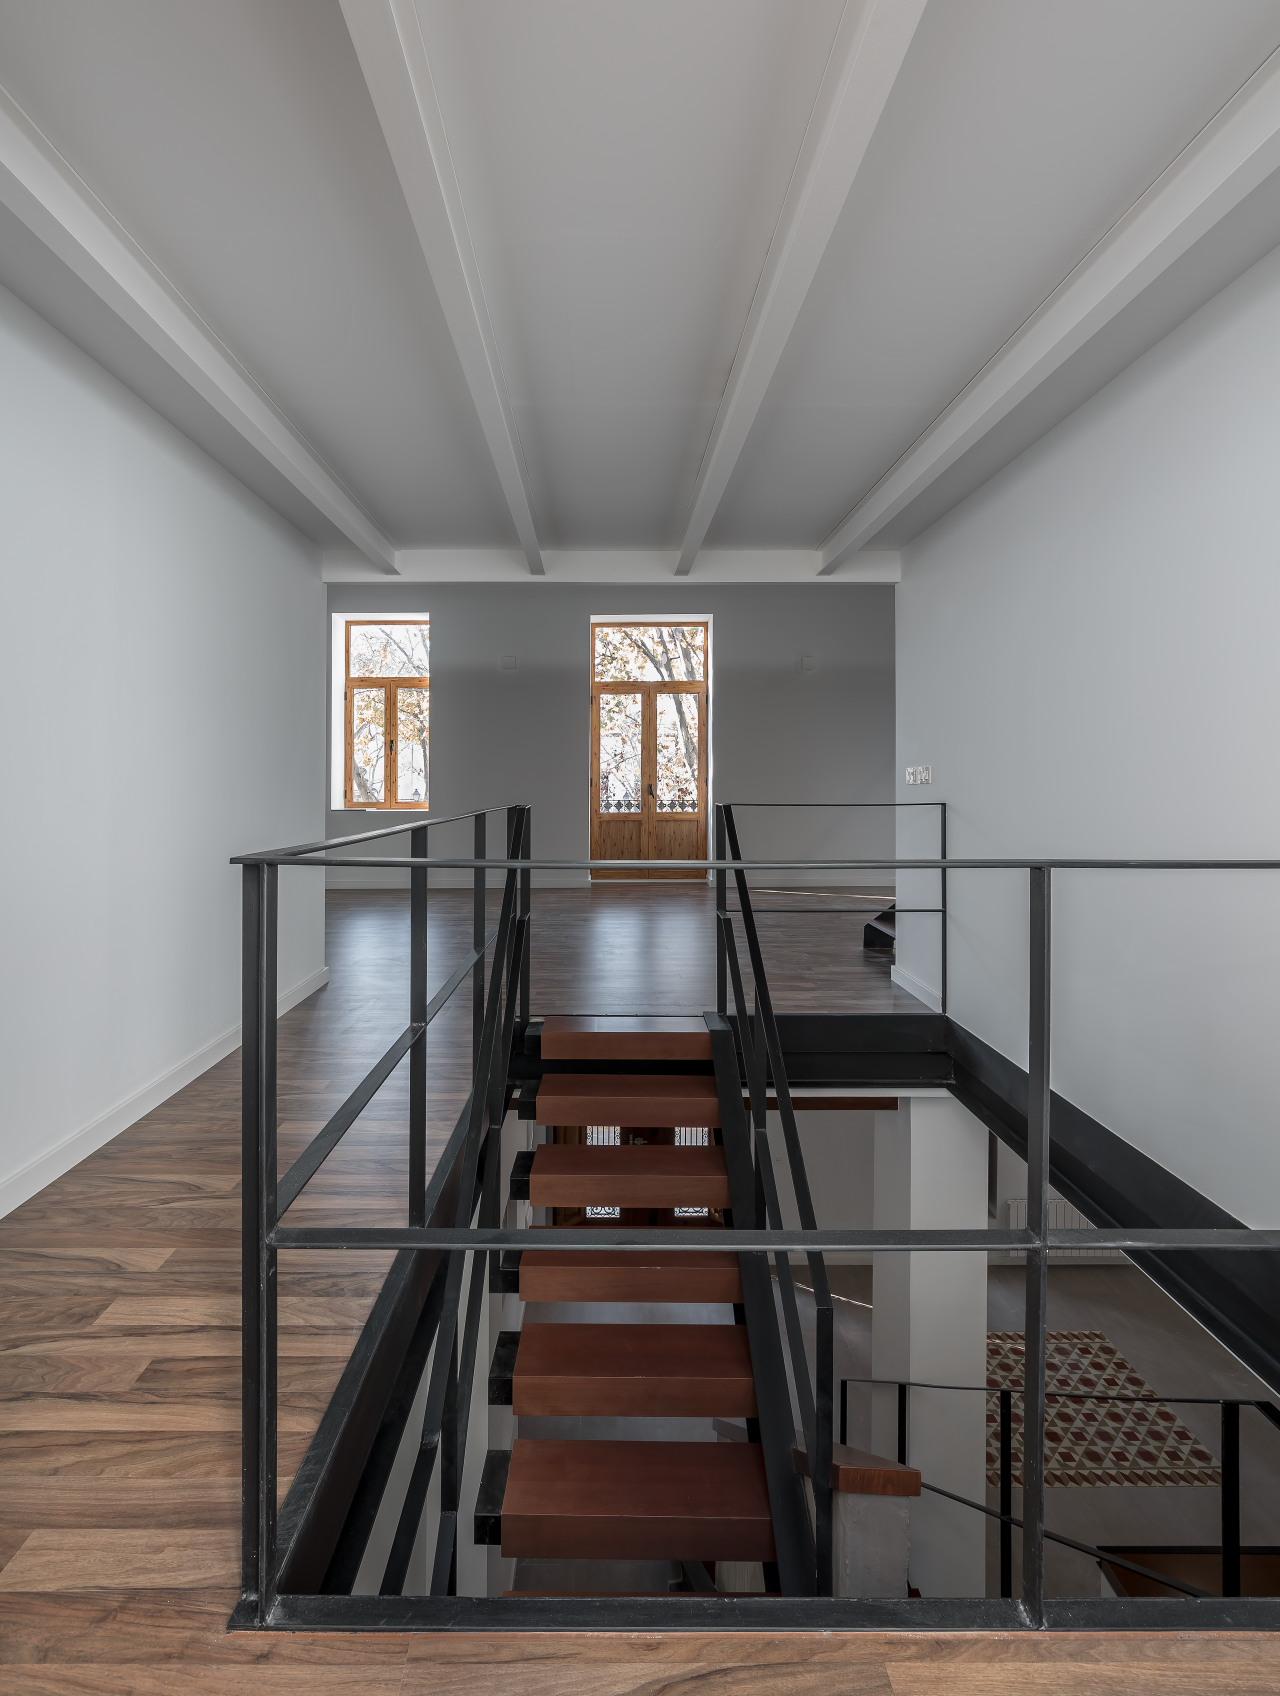 fotografia-arquitectura-valencia-german-cabo-viraje-rehabilitacion-campanar (16)